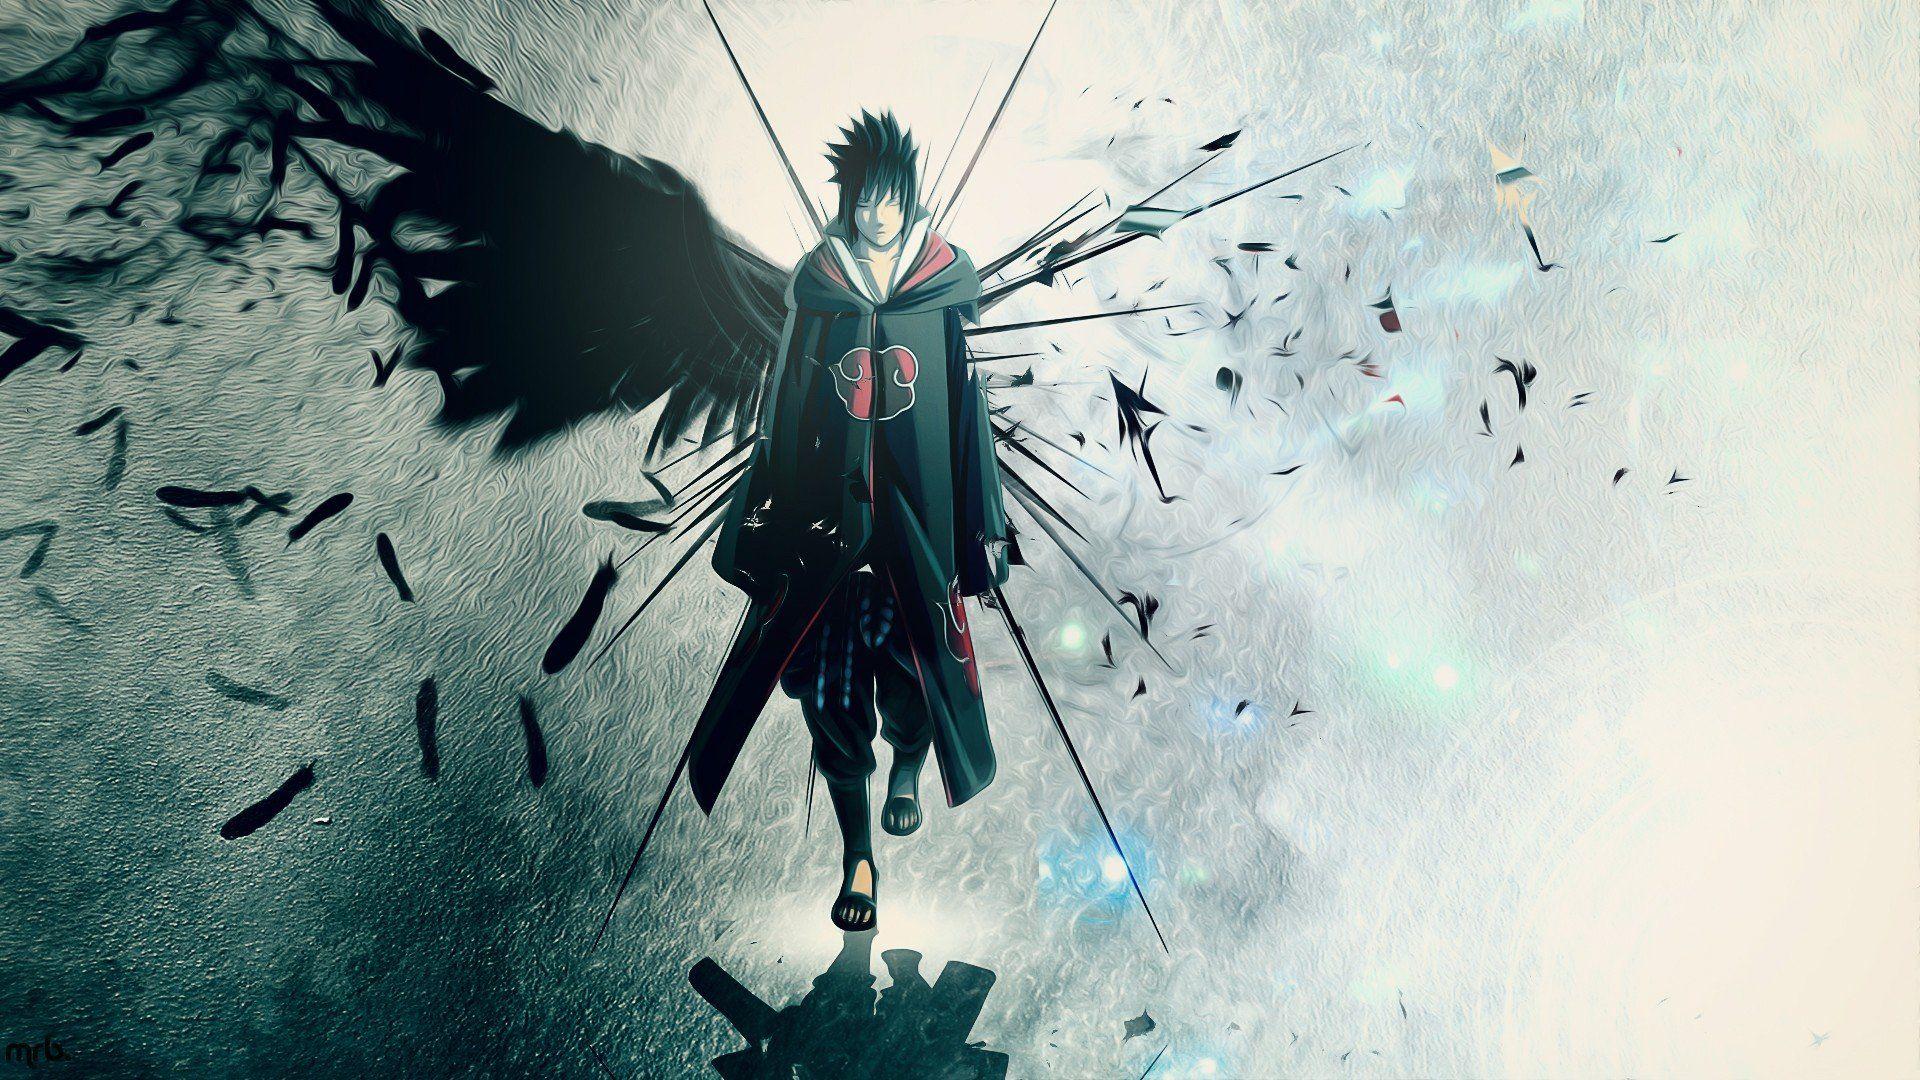 Wings Uchiha Sasuke Naruto Shippuden Akatsuki Feathers Artwork